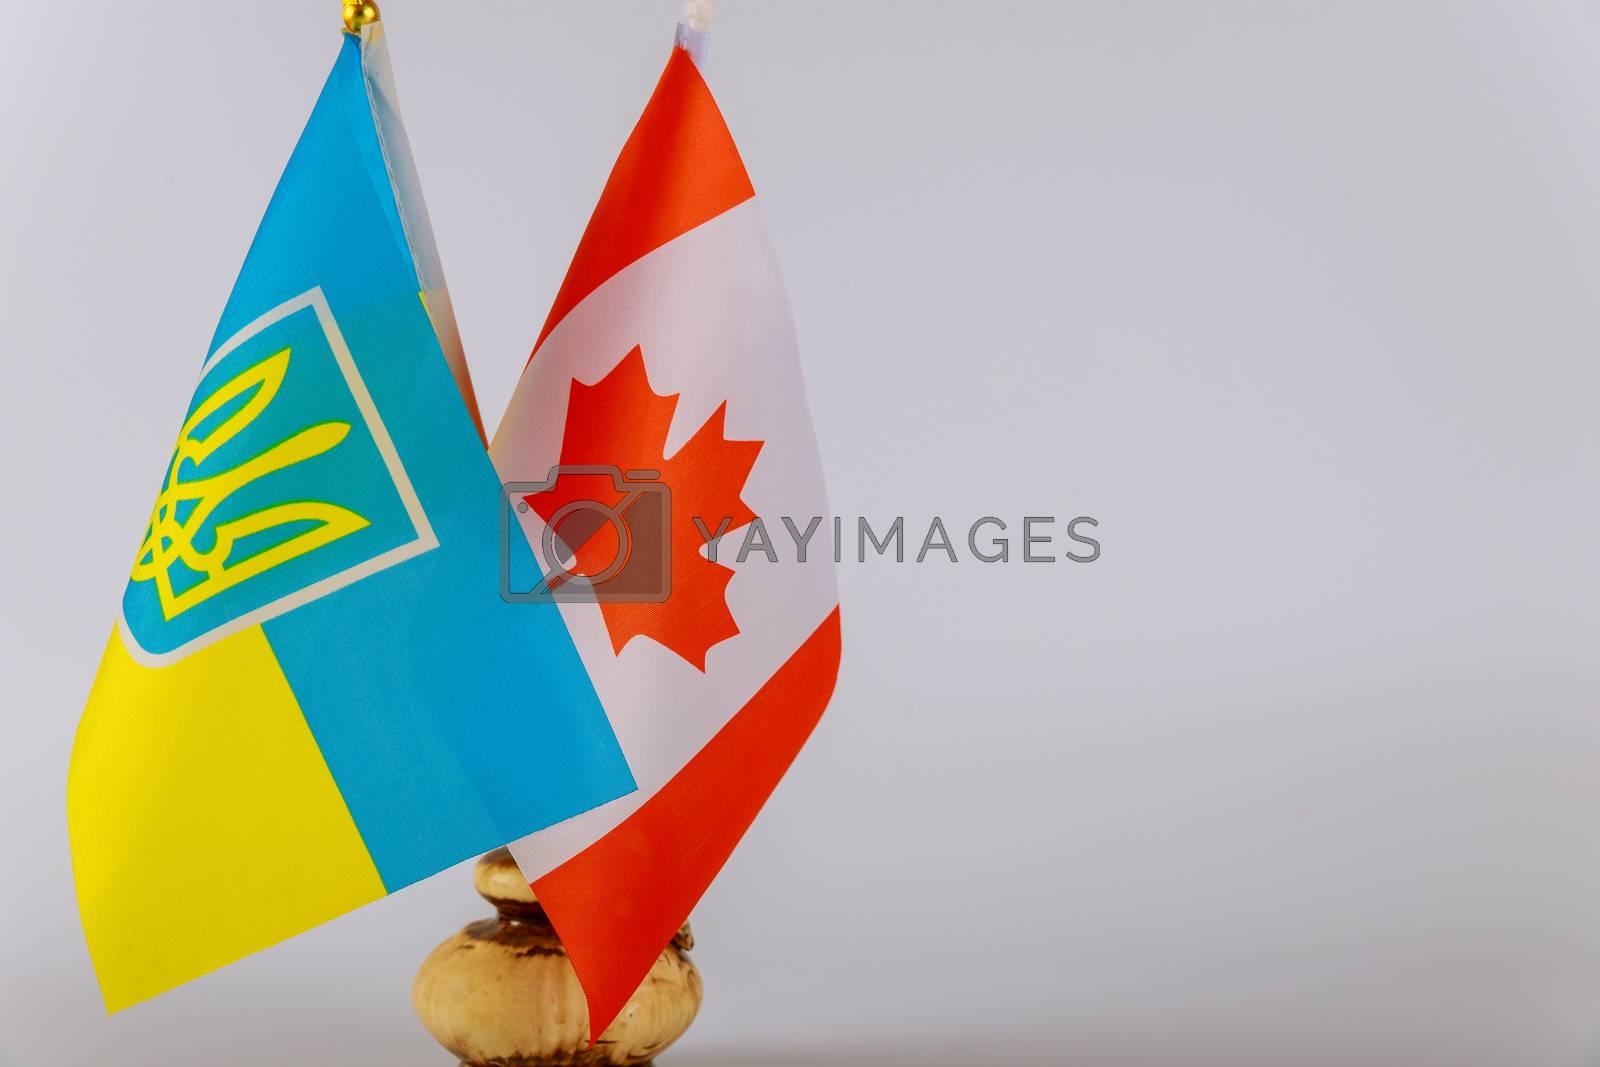 Ukrainian national flags and Canadian flag Symbol of Canadian Ukrainian friendship